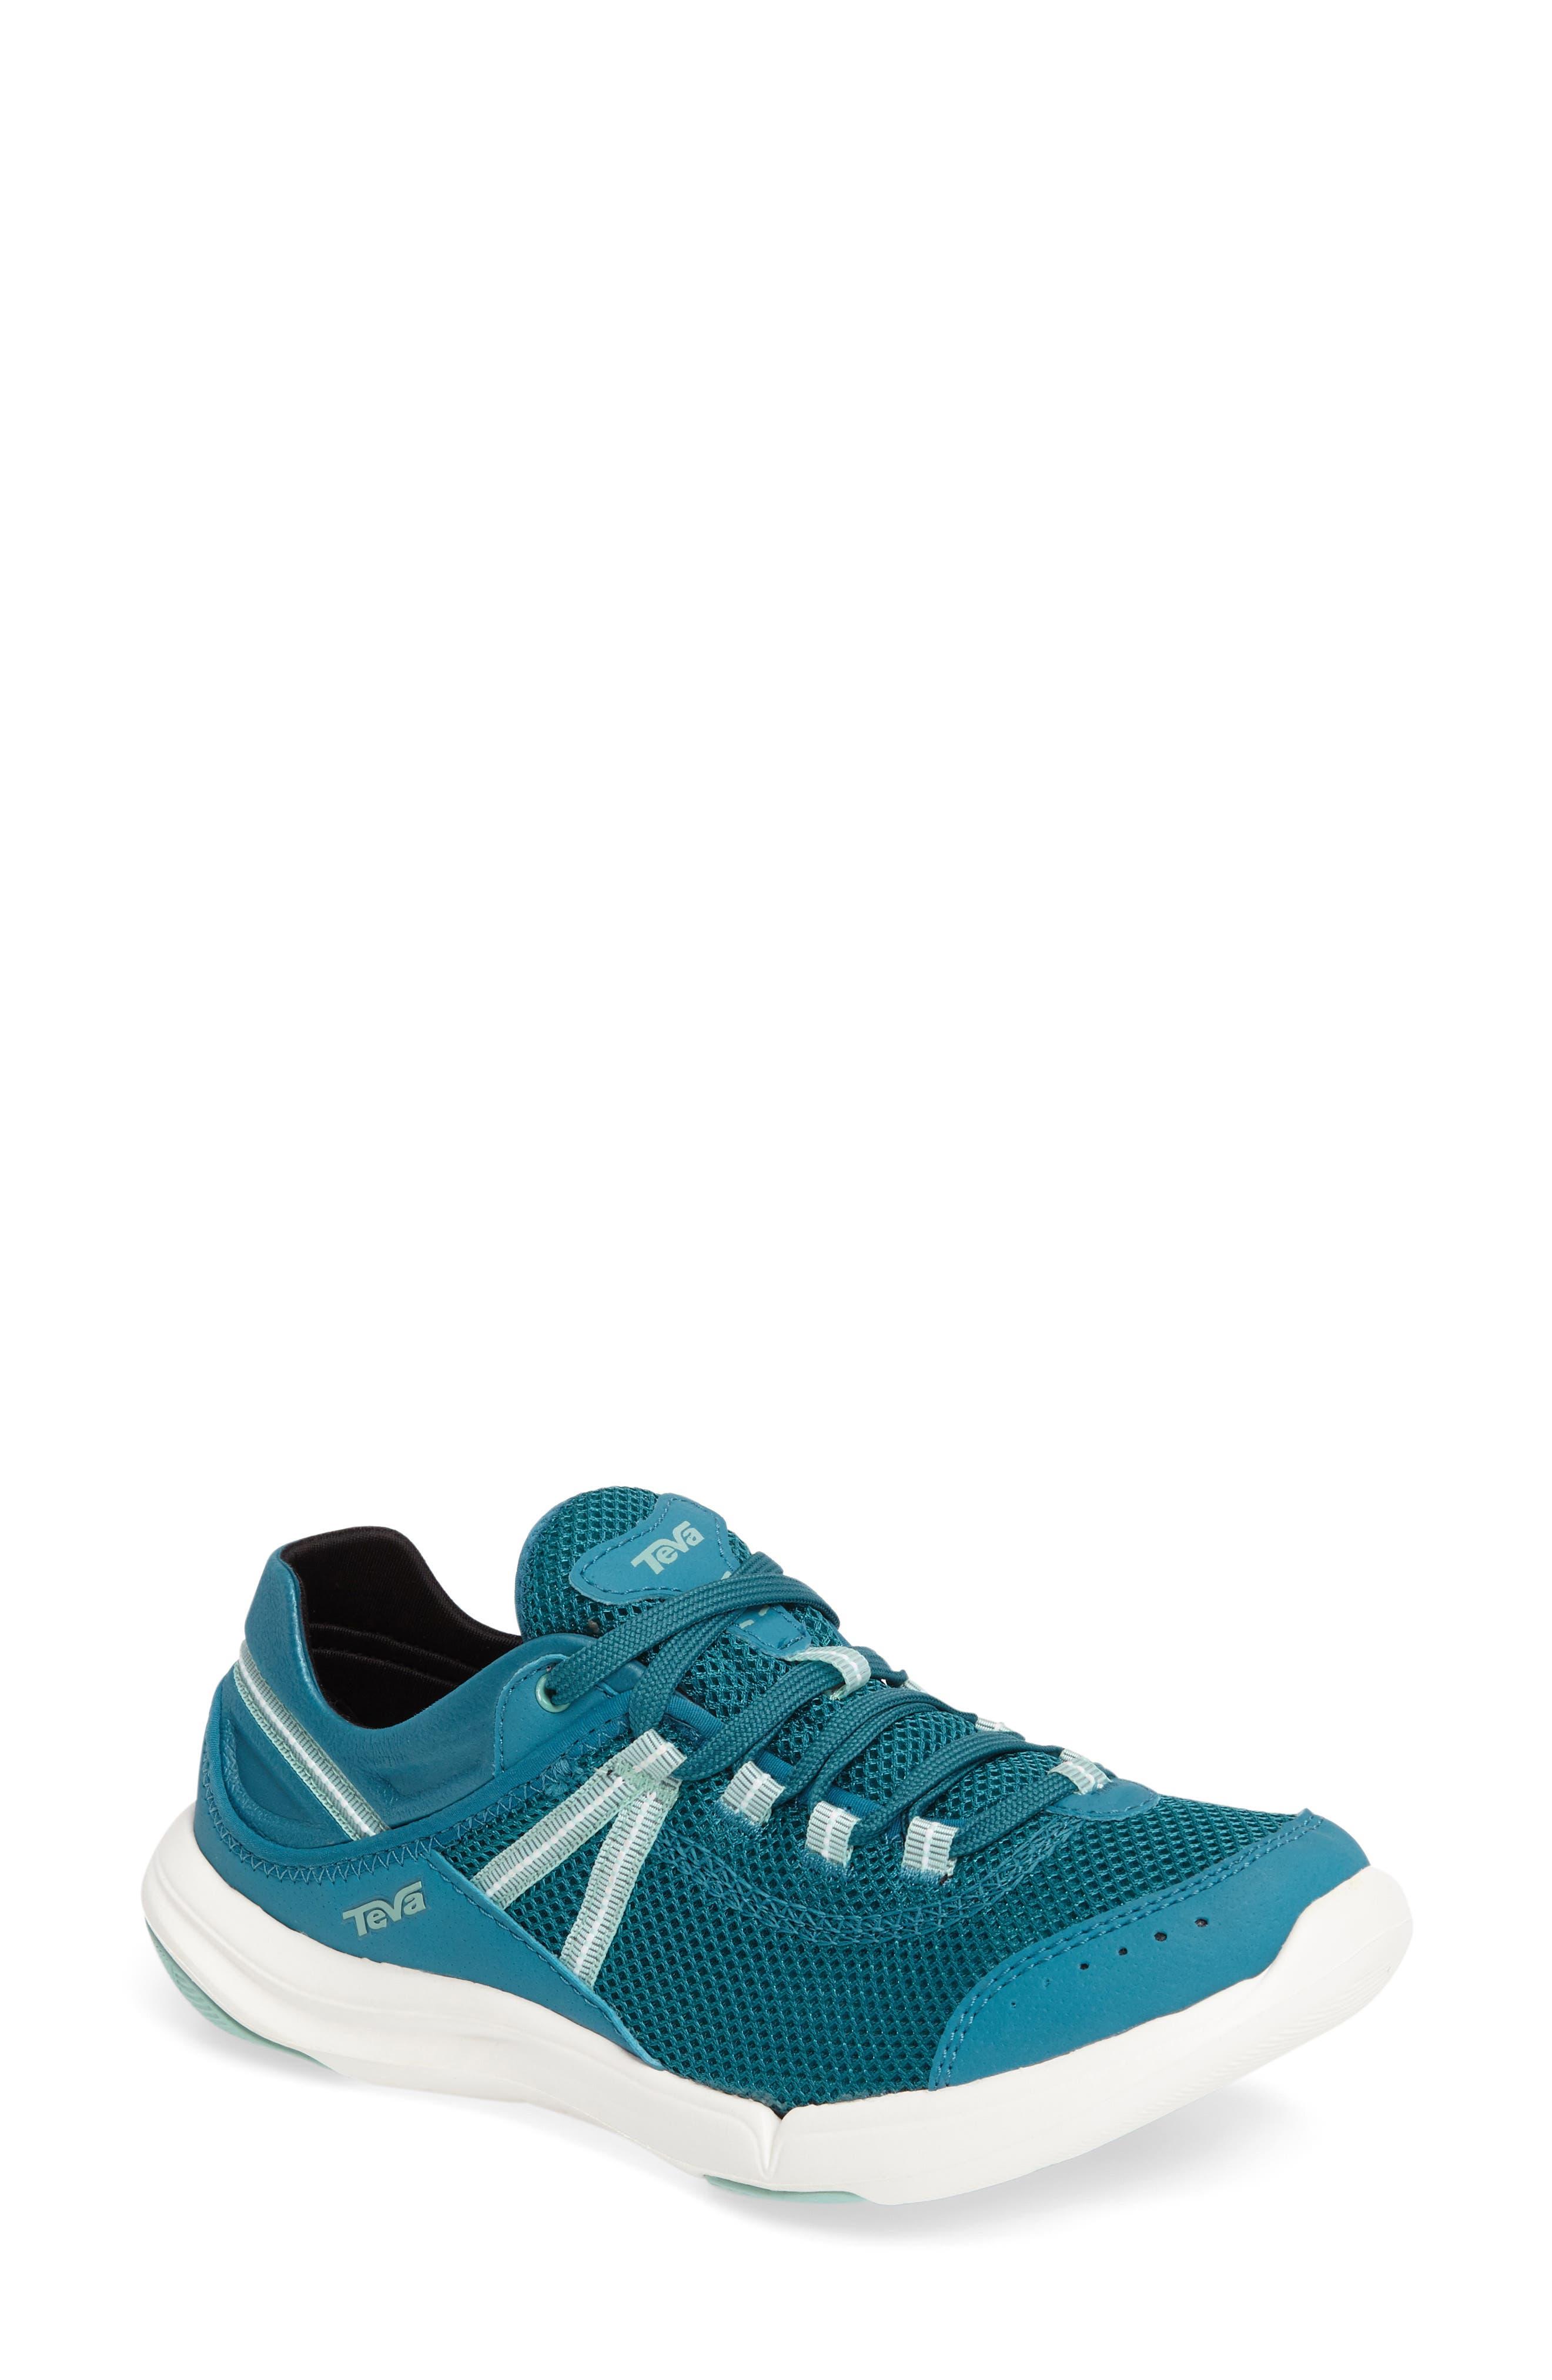 Evo Sneaker,                             Main thumbnail 1, color,                             Blue Fabric